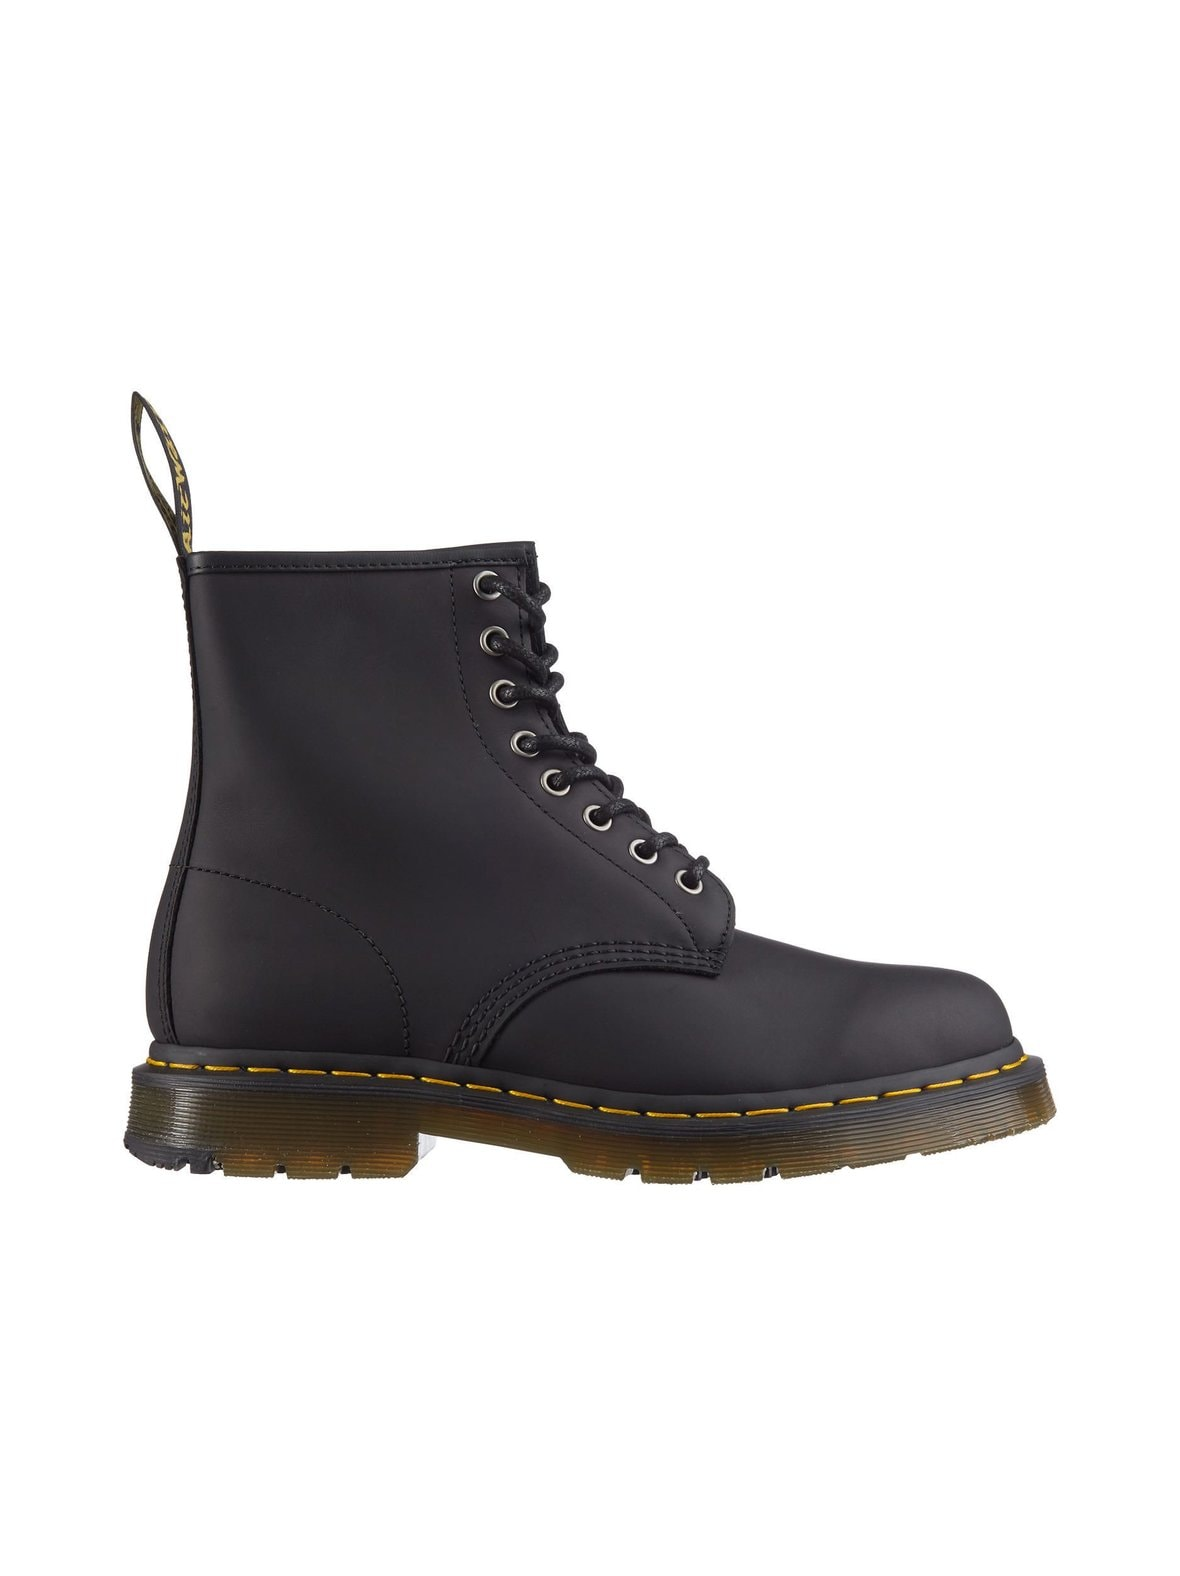 Musta Dr. Martens 1460 Wintergrip -kengät  a3c0b0a5a5